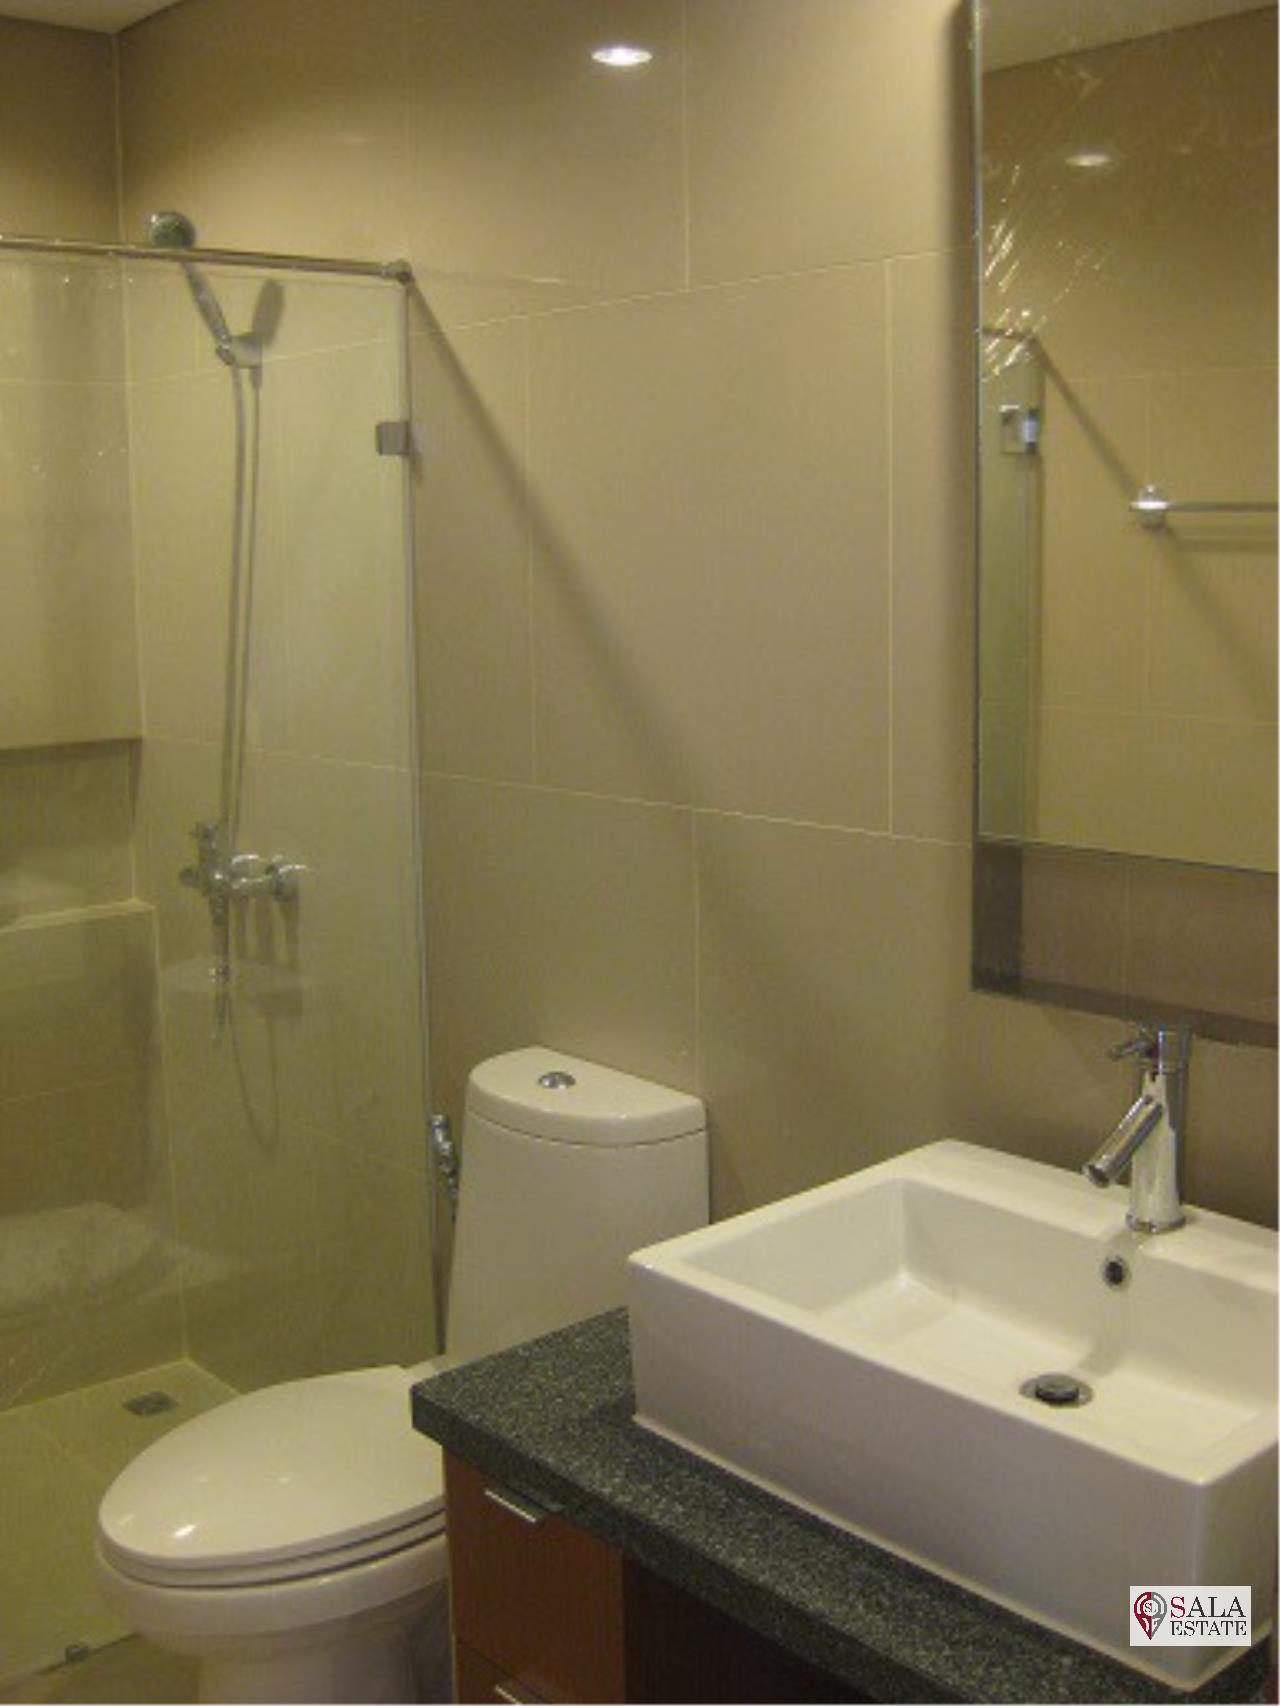 SALA ESTATE Agency's VILLA SATHORN – BTS KRUNG THONBURI,STUDIO TYPE, 1 Bedroom 1 Bathroom, Fully furnished, City View 11